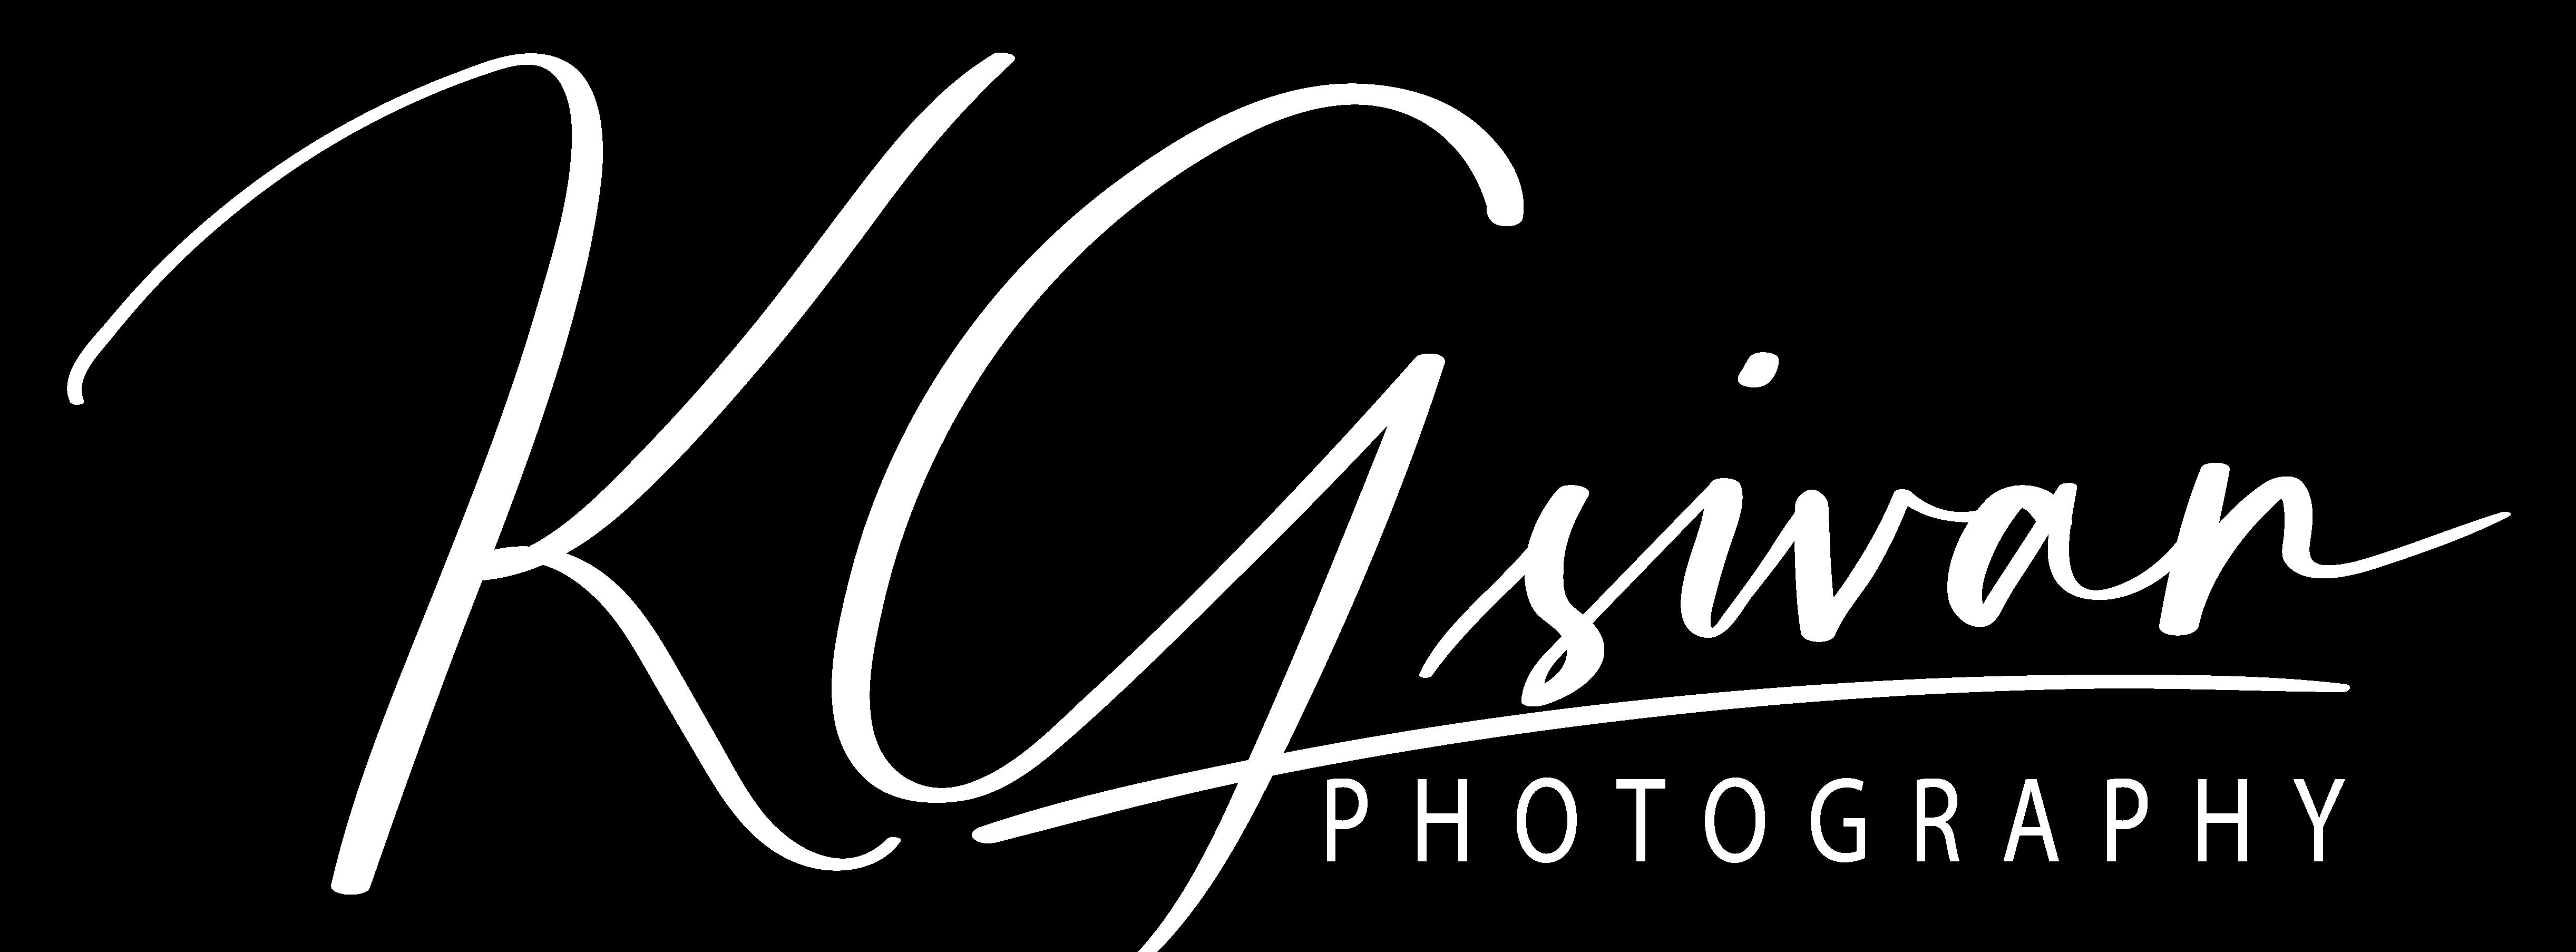 KGsivan Photography